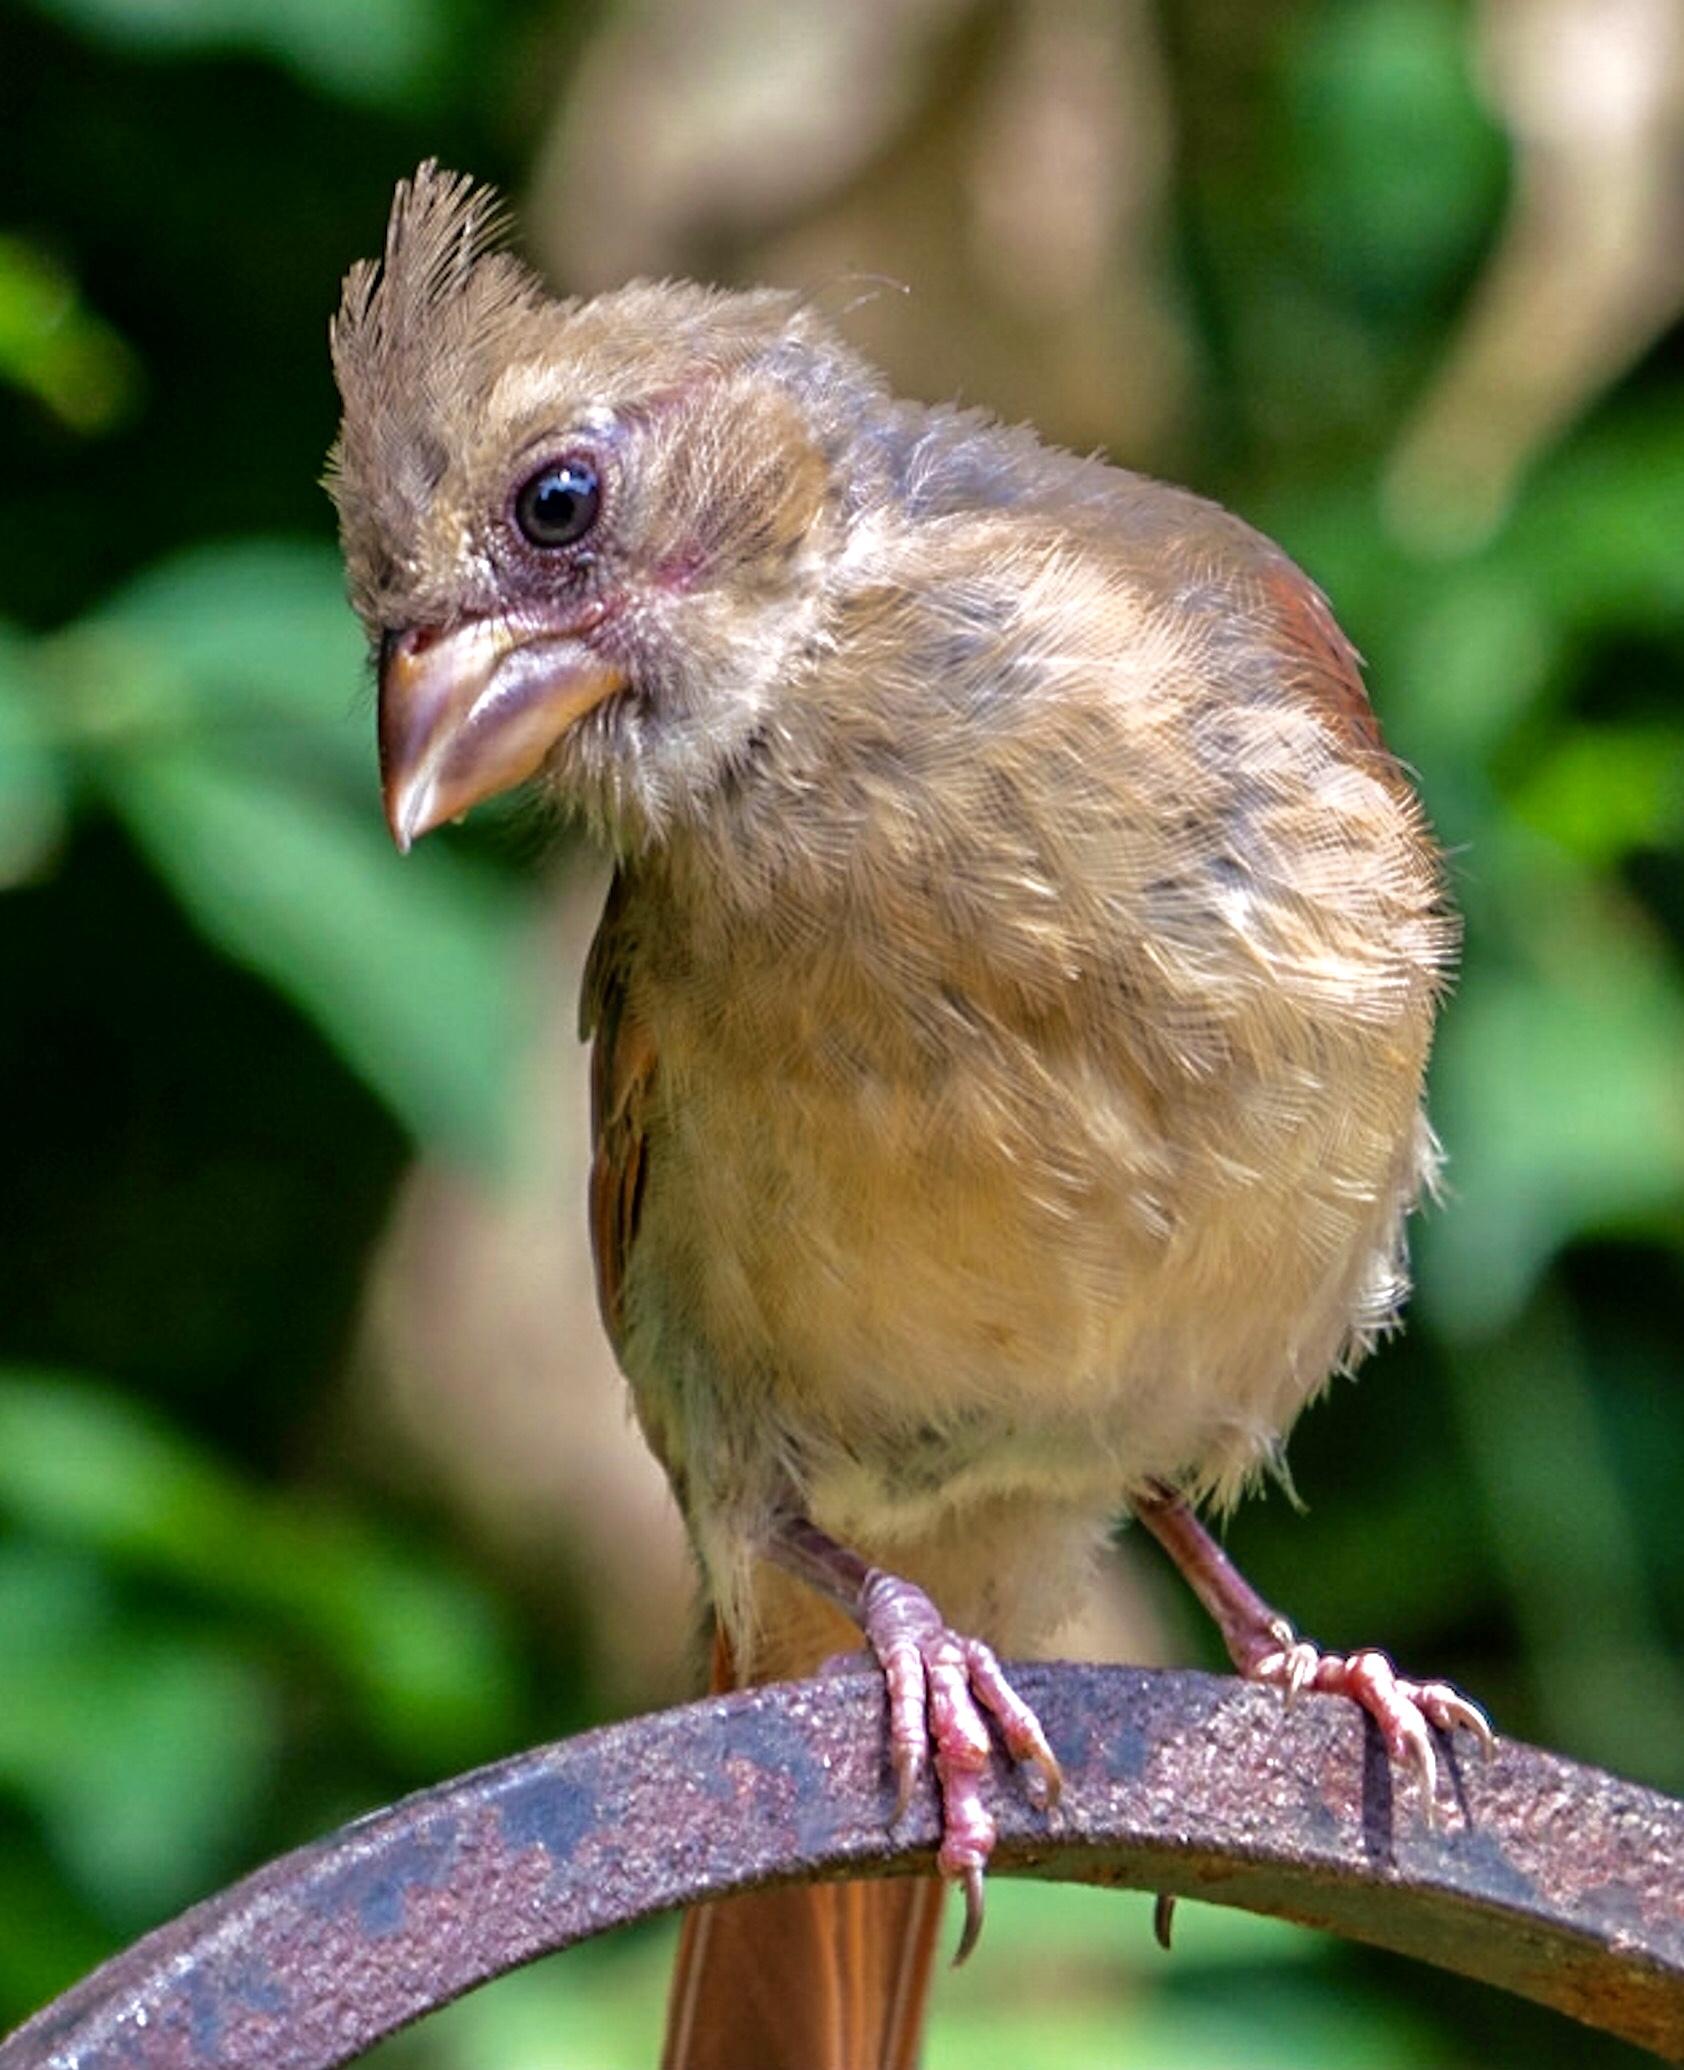 Teenaged Cardinal